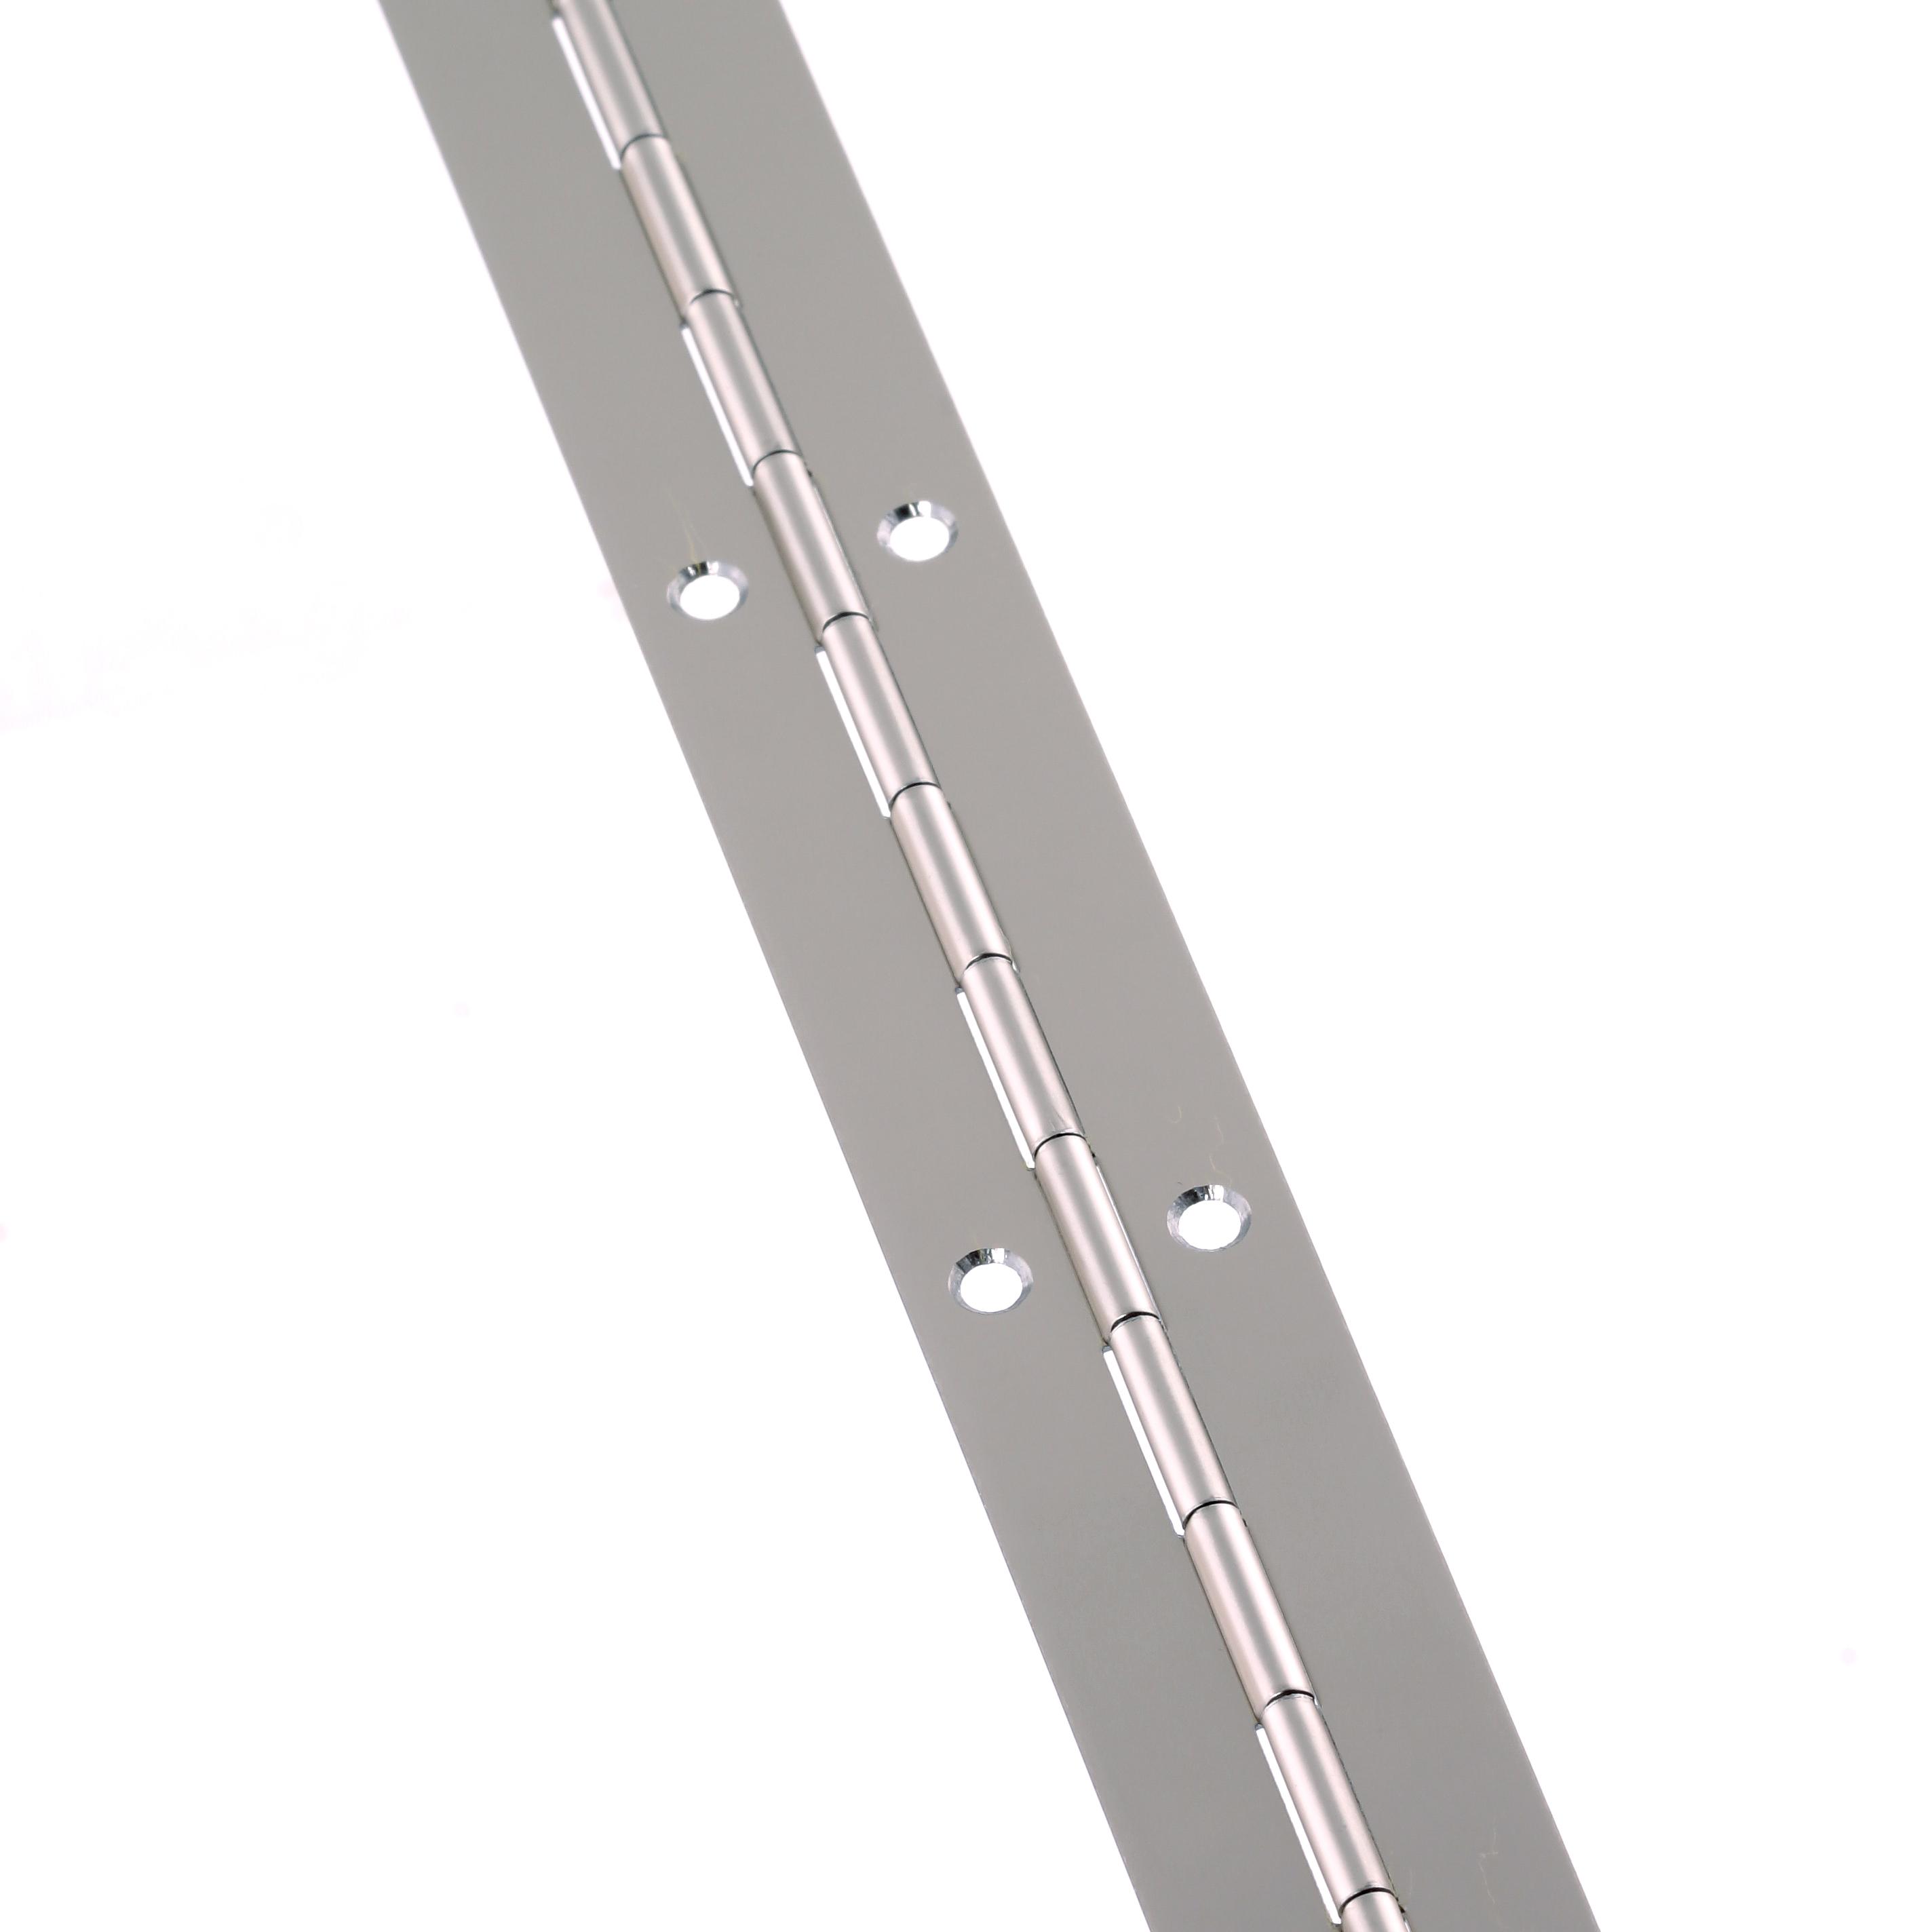 Steel Piano Hinge - 1800 x 25 x 0.7mm - Nickel Plated